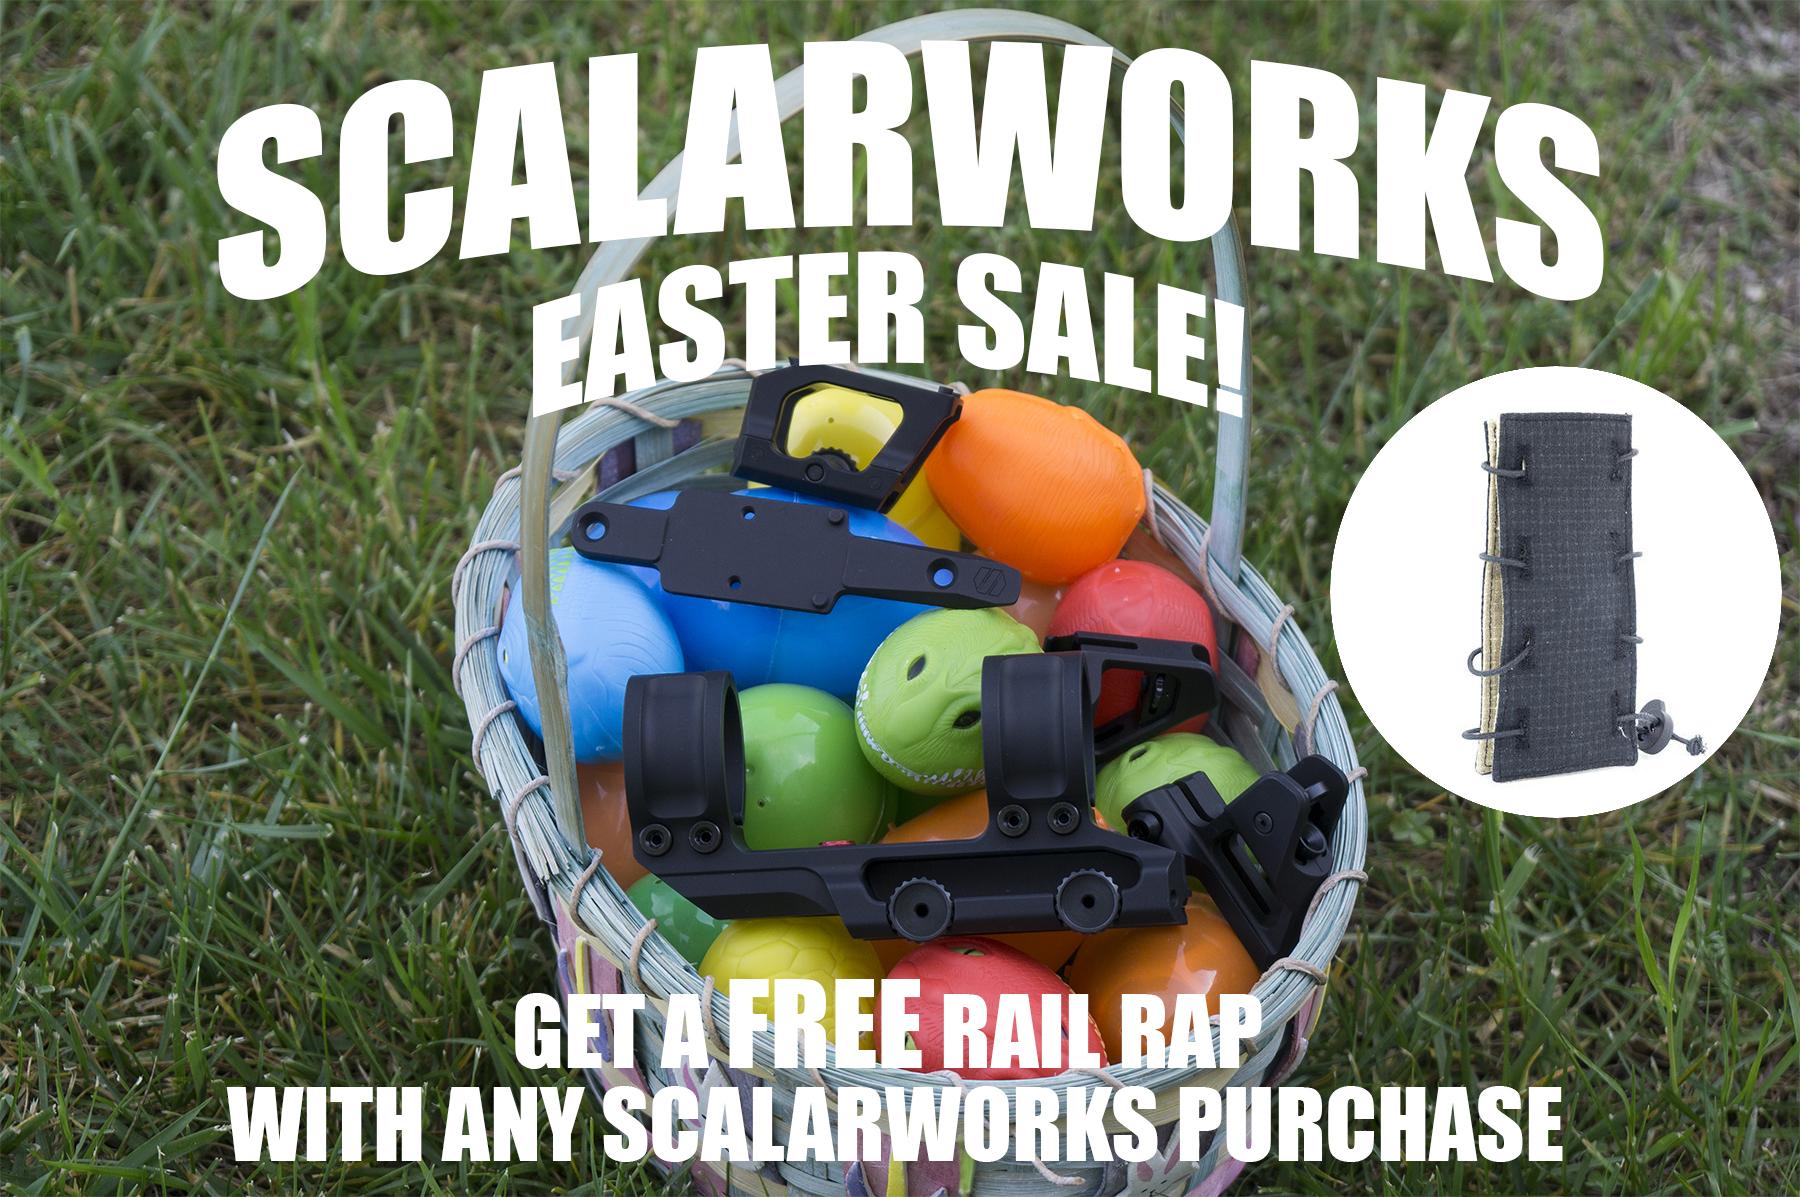 easter-scalar-sale-forig-railrapbubble.jpg